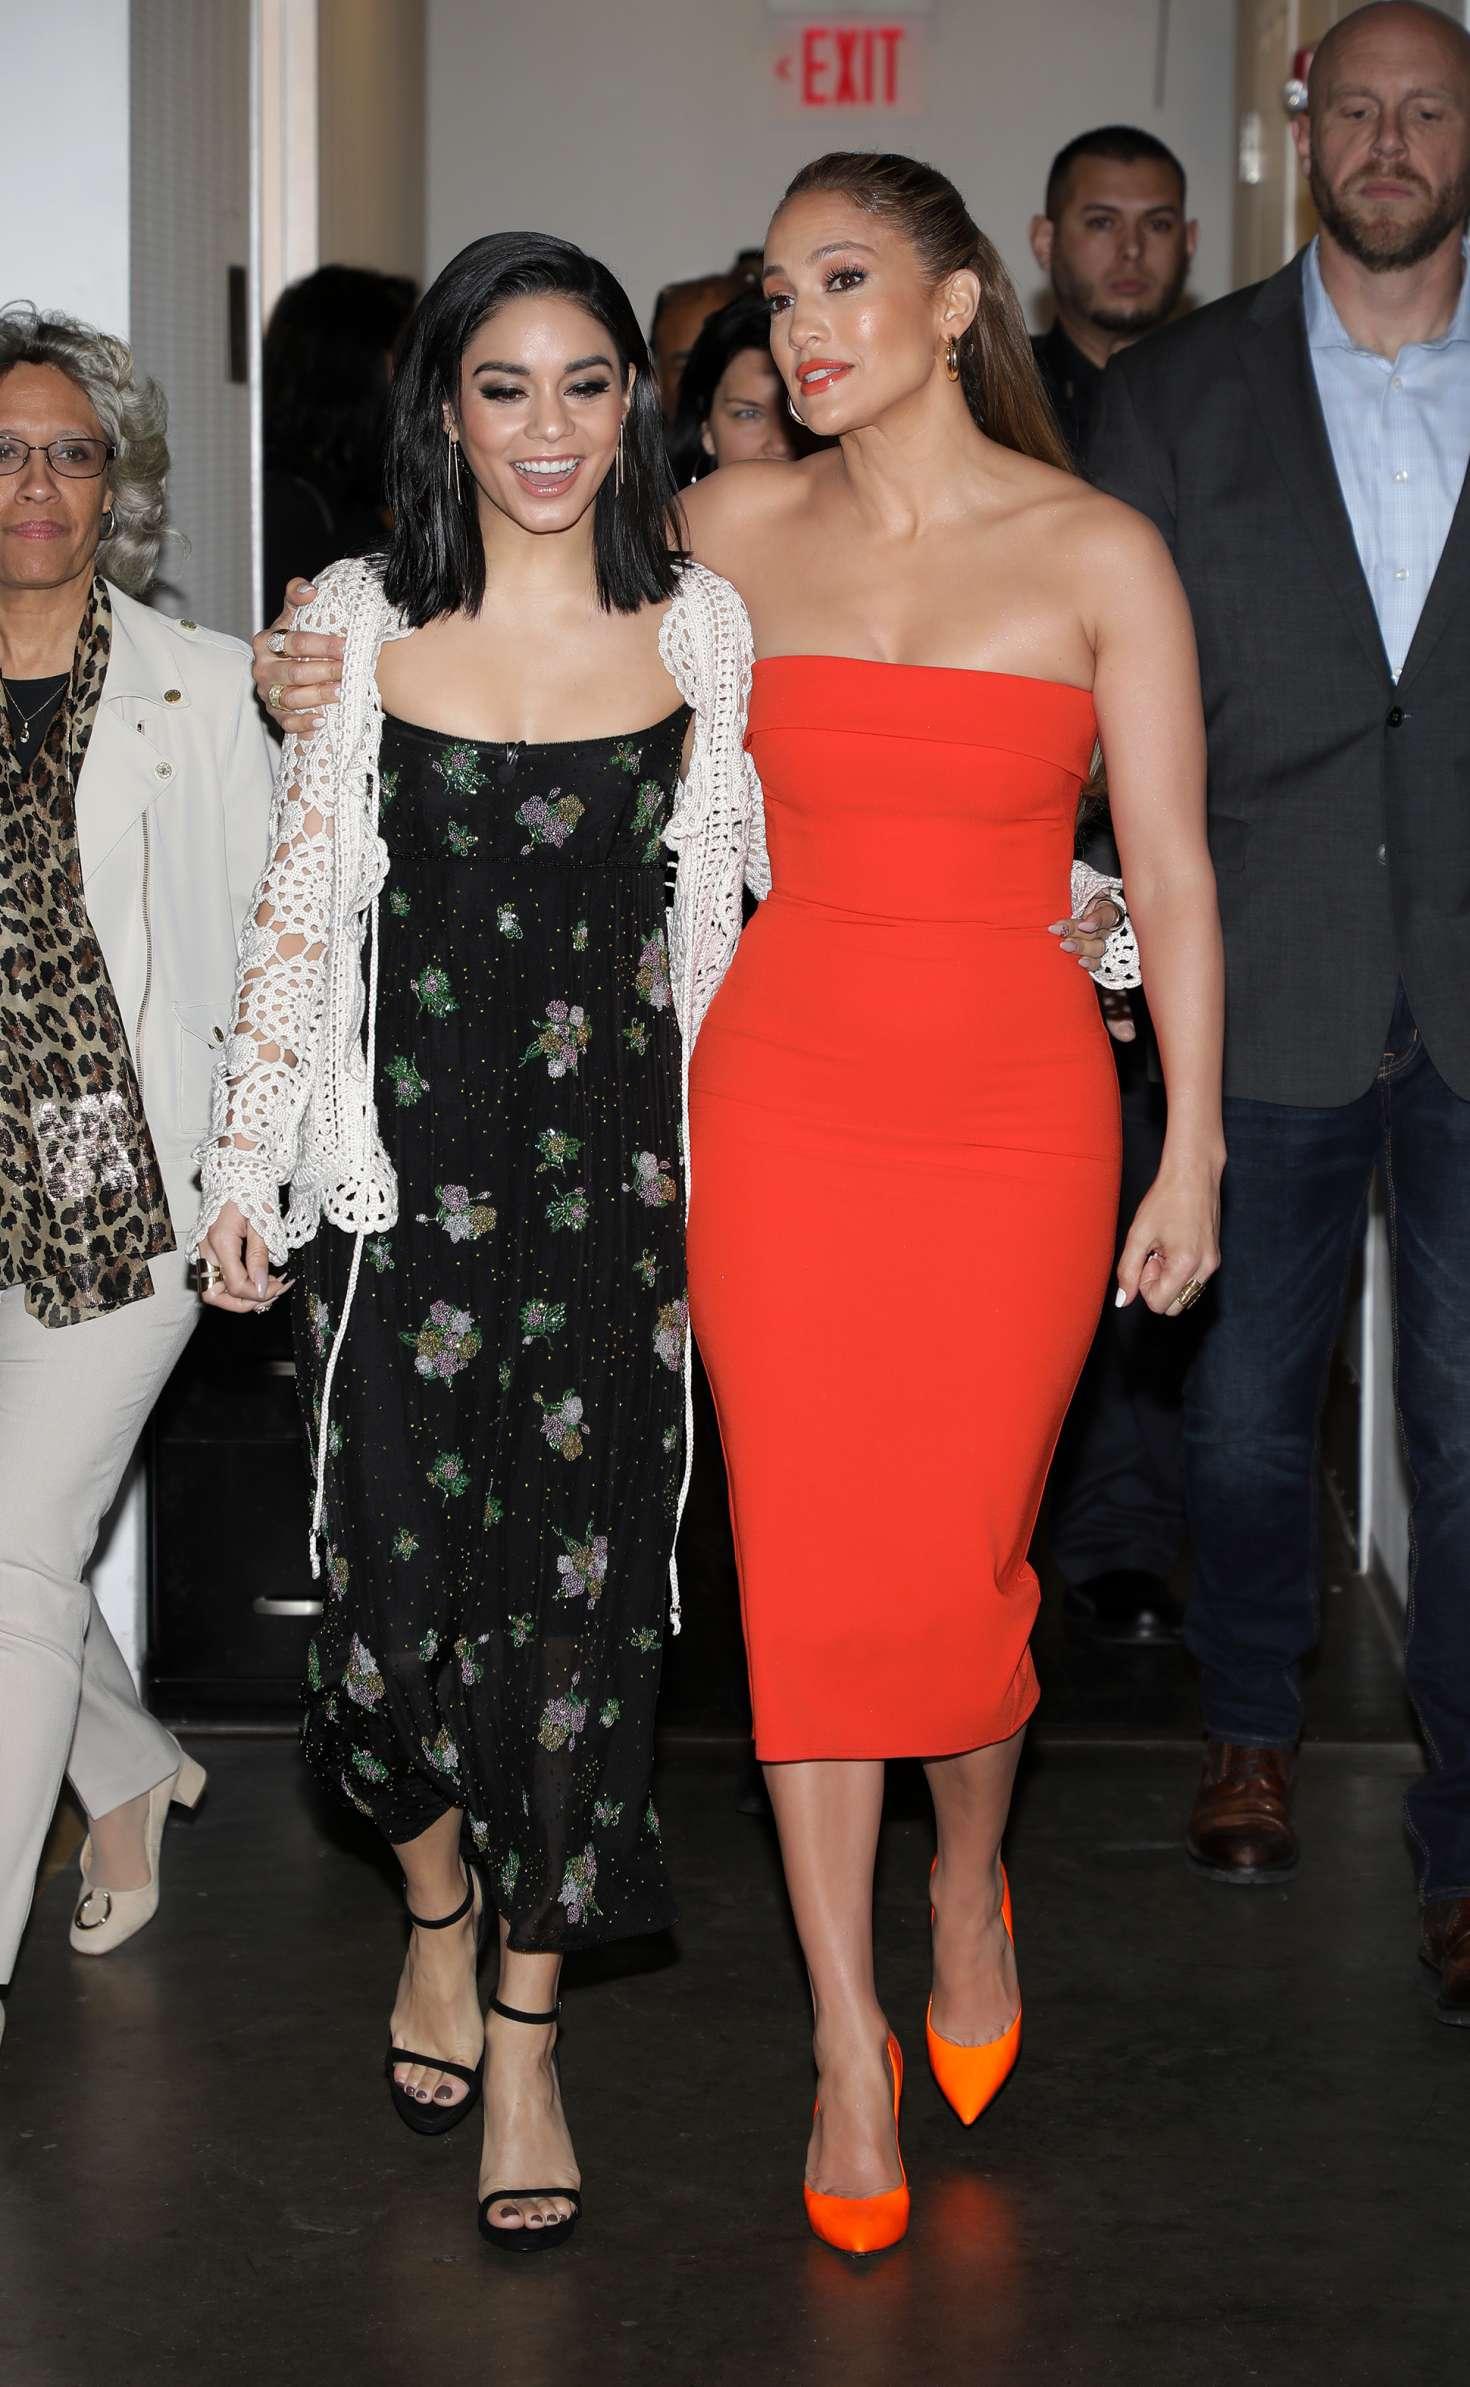 Vanessa Hudgens and Jennifer Lopez - Arriving at Univision's Despierta America Show in Miami